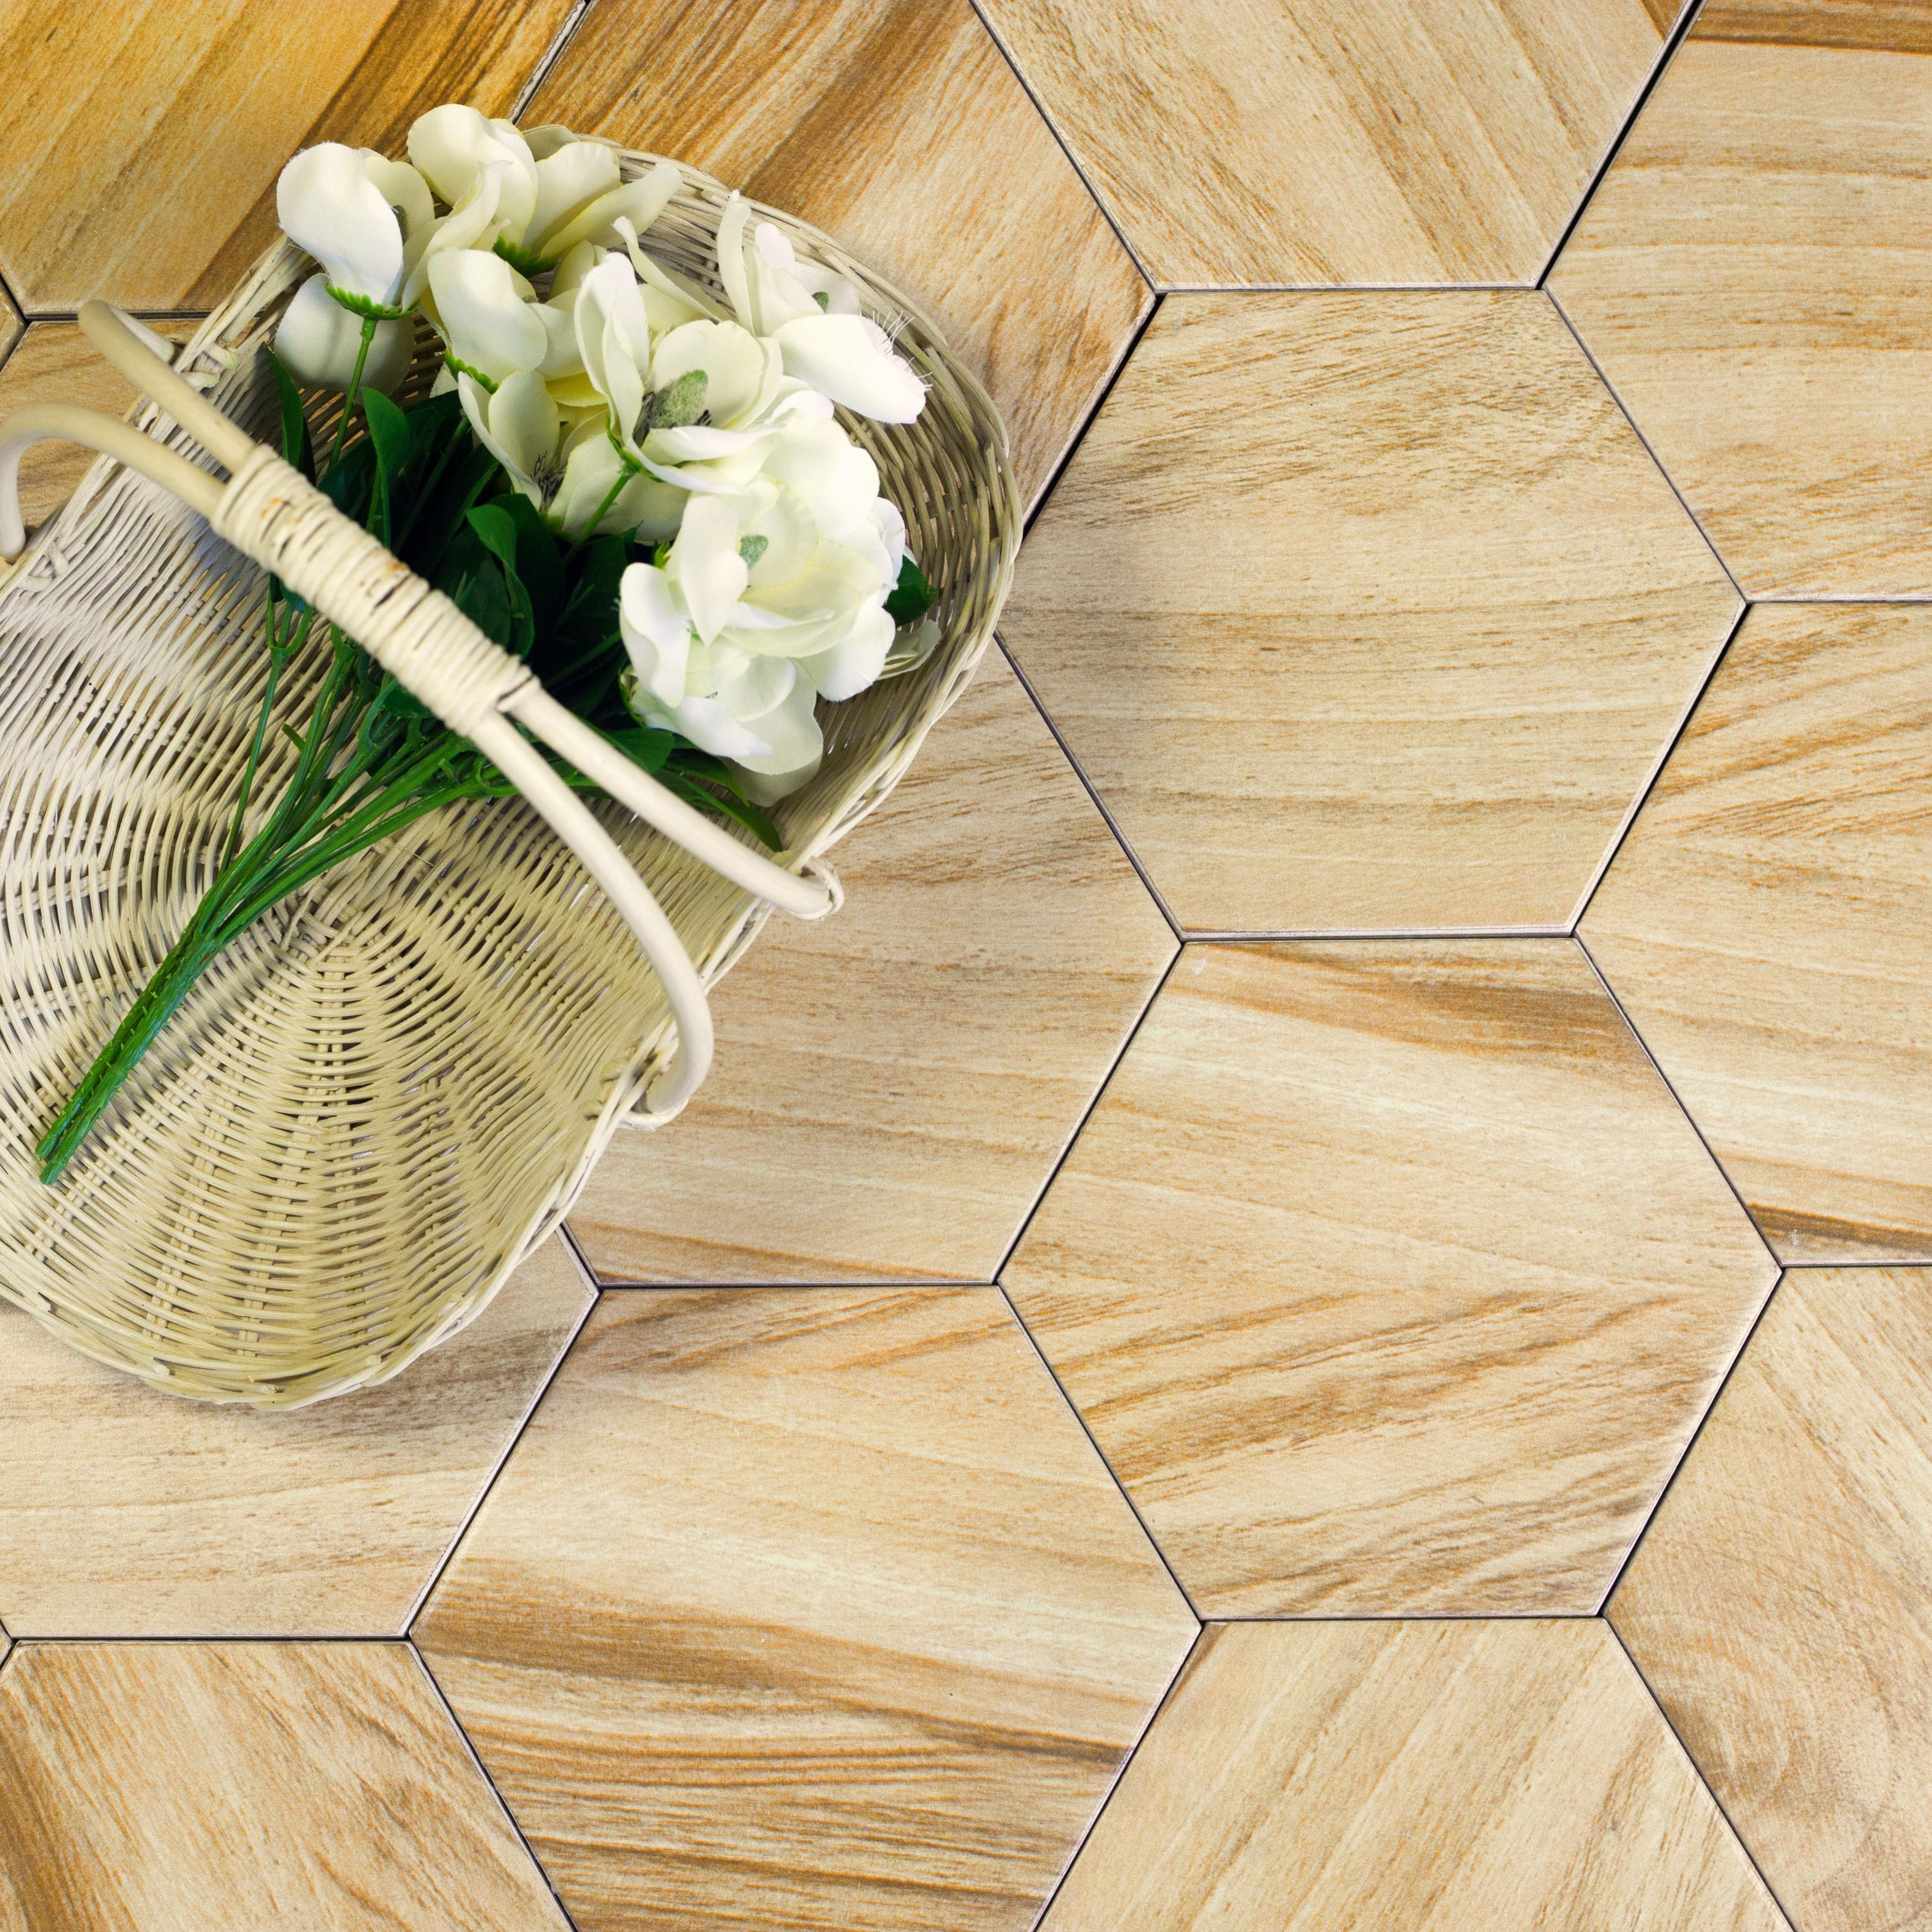 Artisan Wood 8 in x 8 in Ceramic Hexagon Tile in FRESH PINE Matte